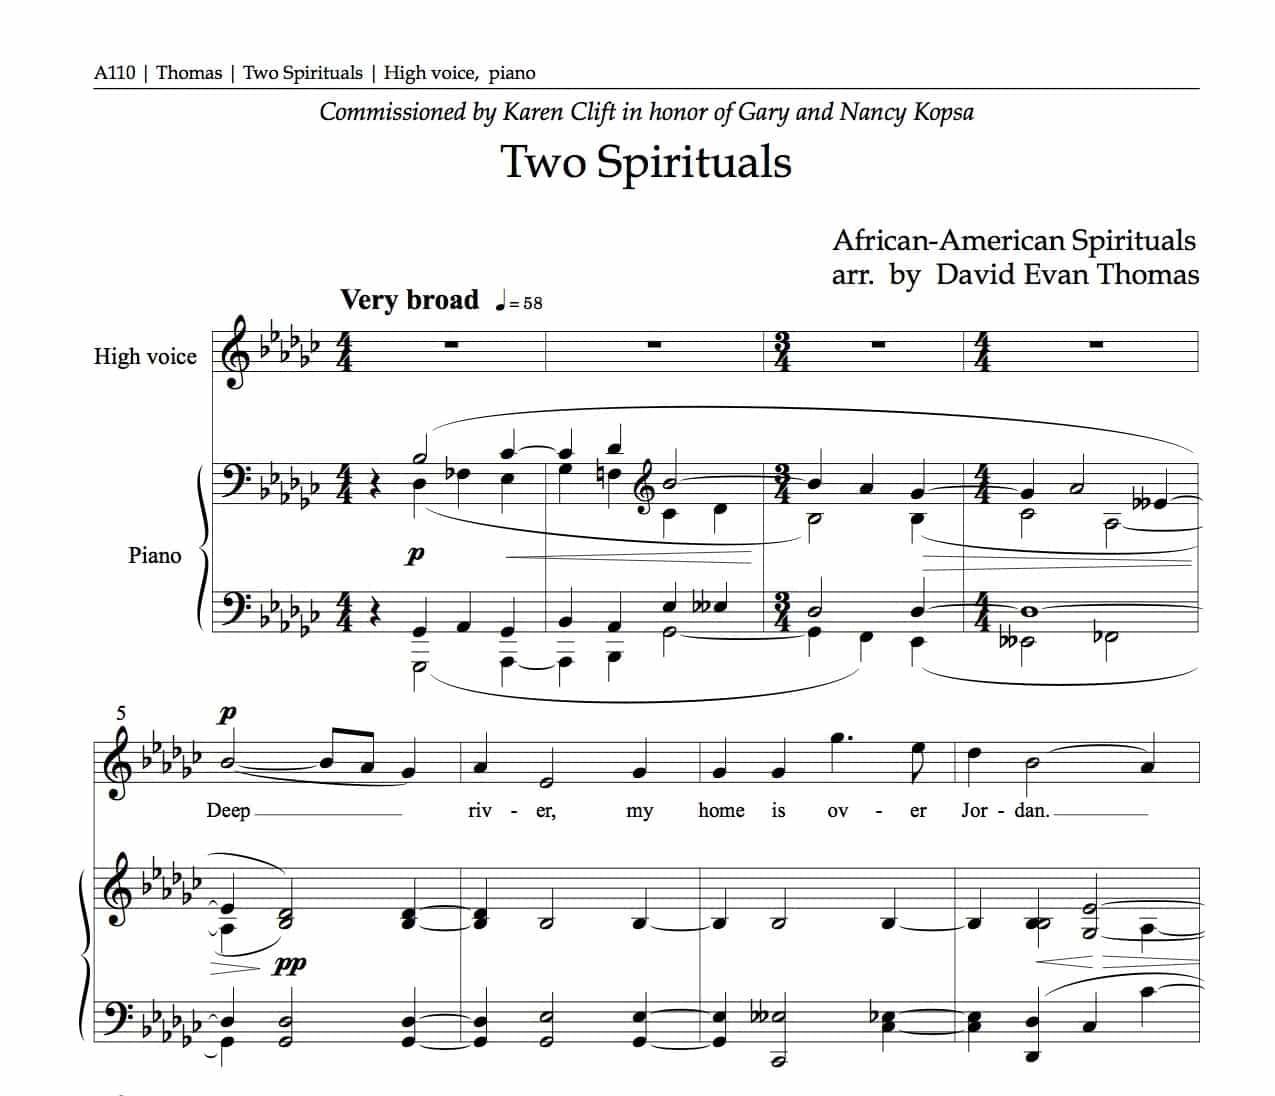 Opening bars of Two Spirituals, by David Evan Thomas